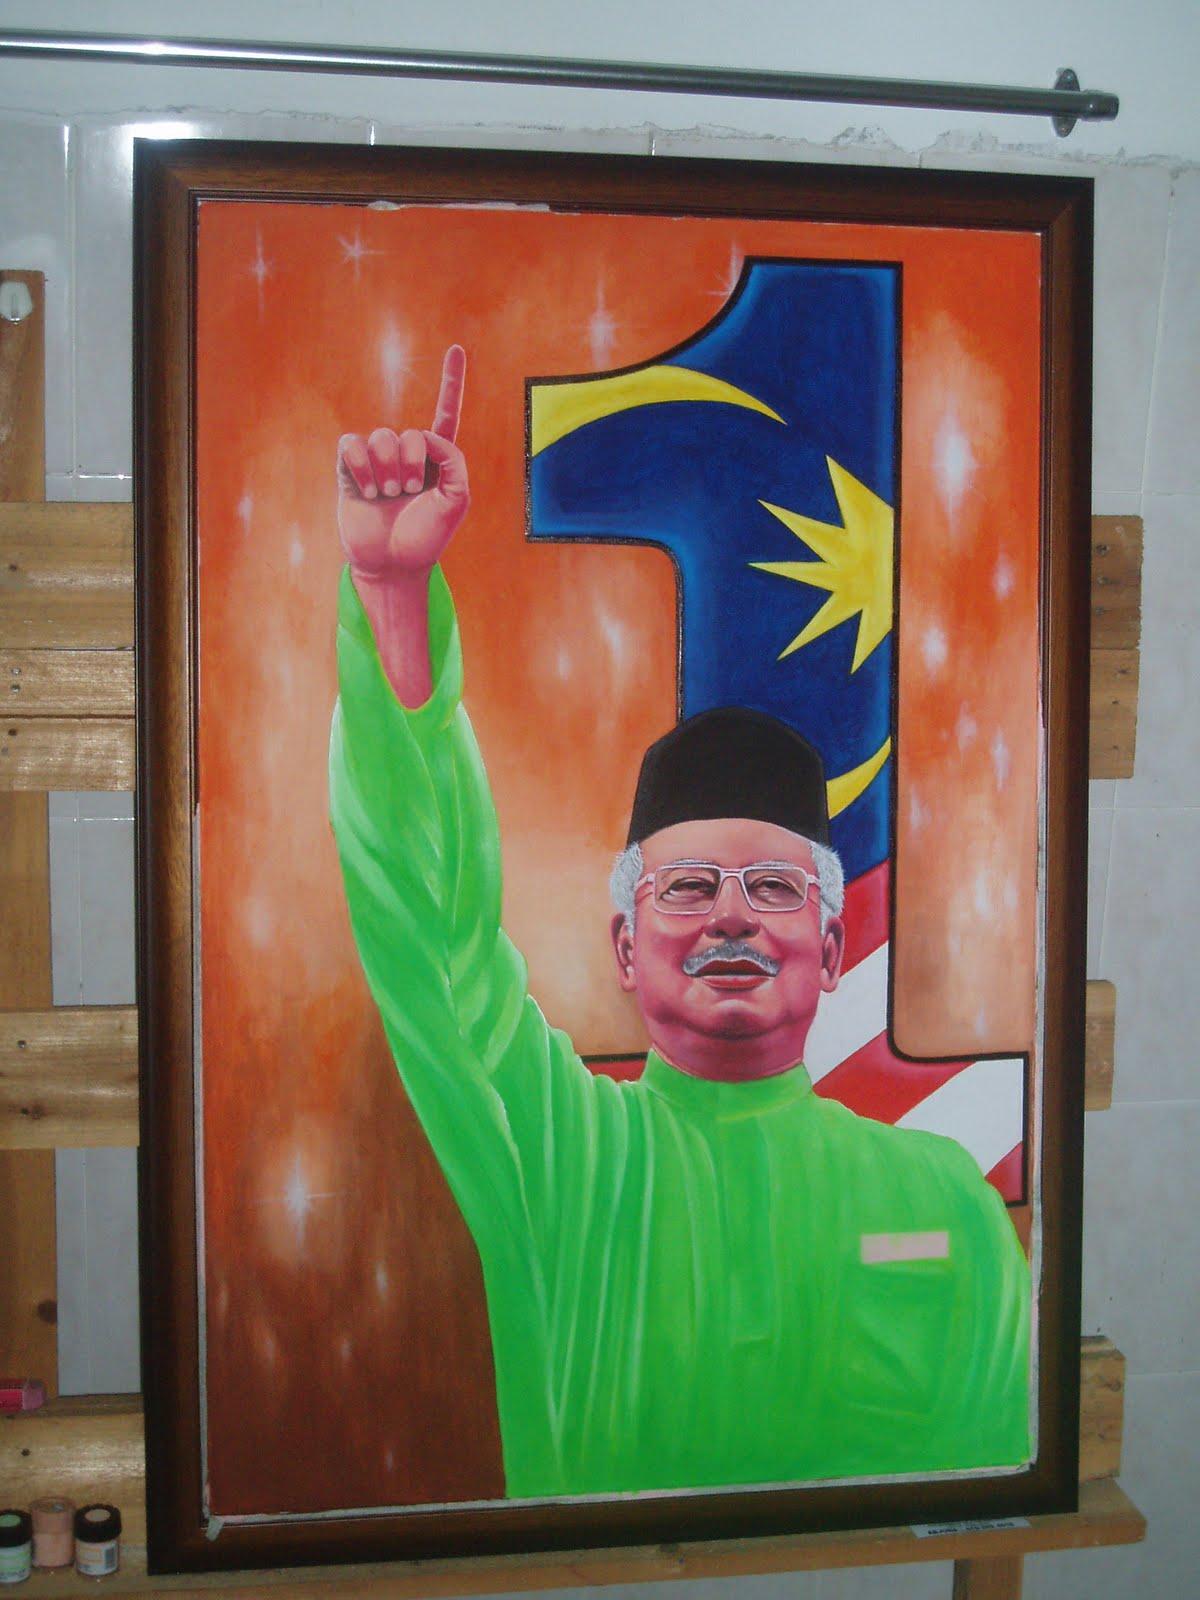 Pelukis mural shah alam potret 1 malaysia for Mural 1 malaysia